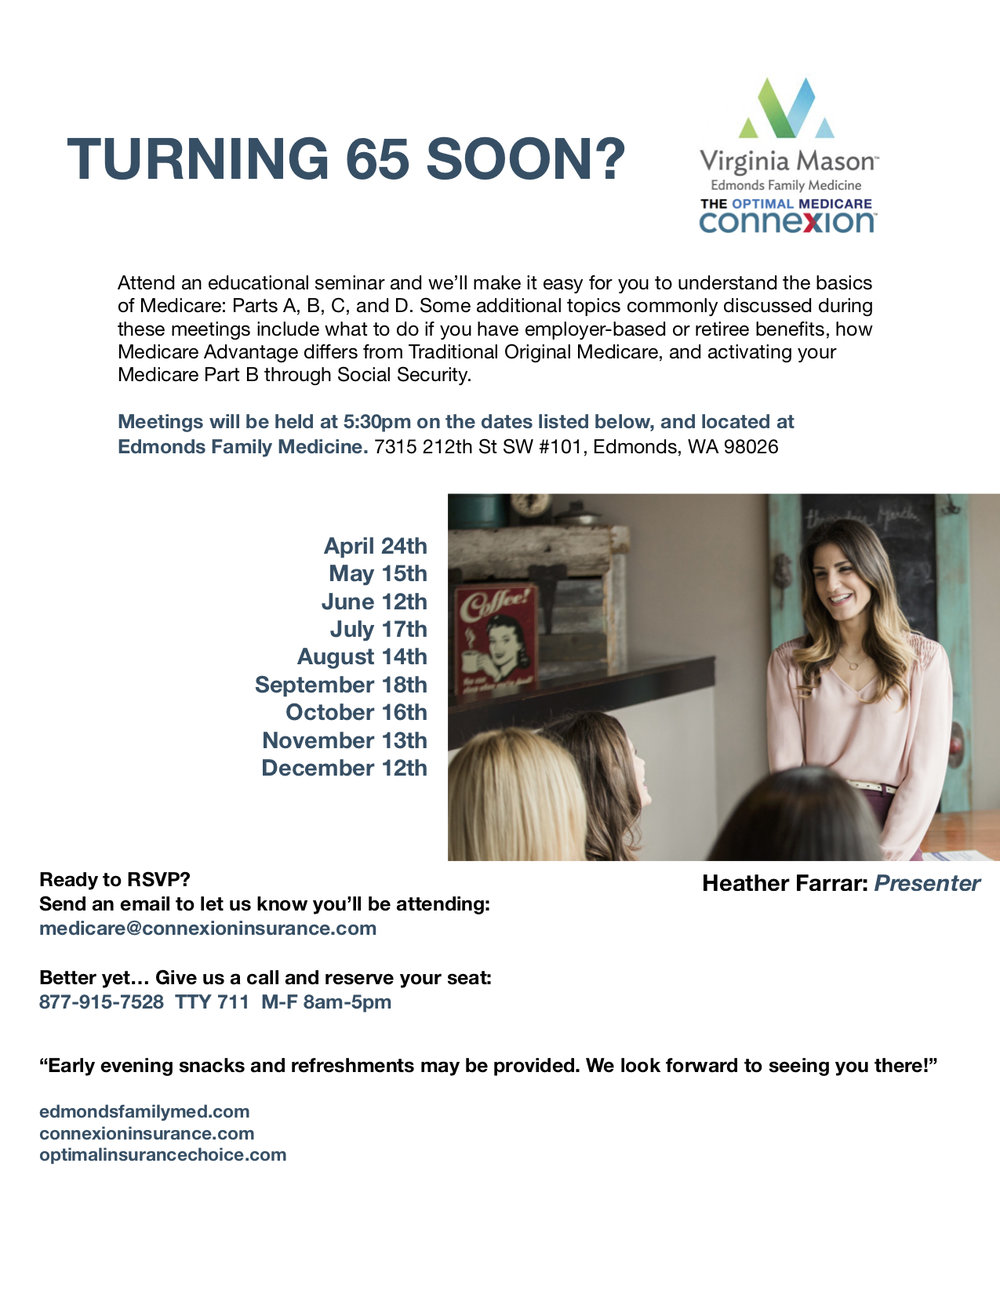 EFM Turning 65 Soon Poster Final Proof 18.jpg